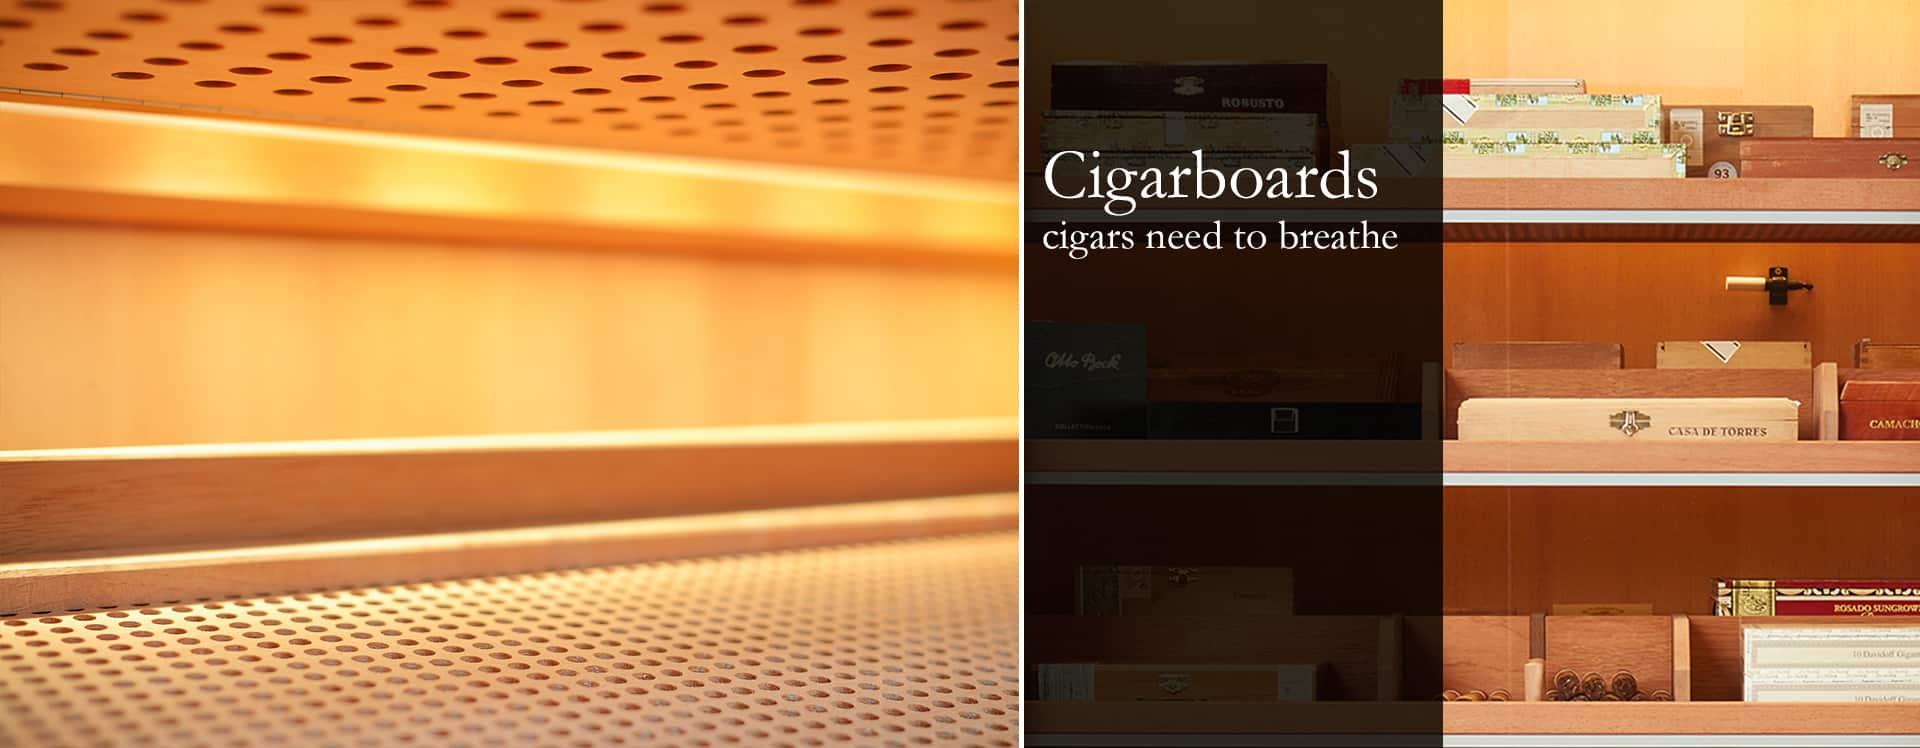 GERBER Humidors Cigarboards